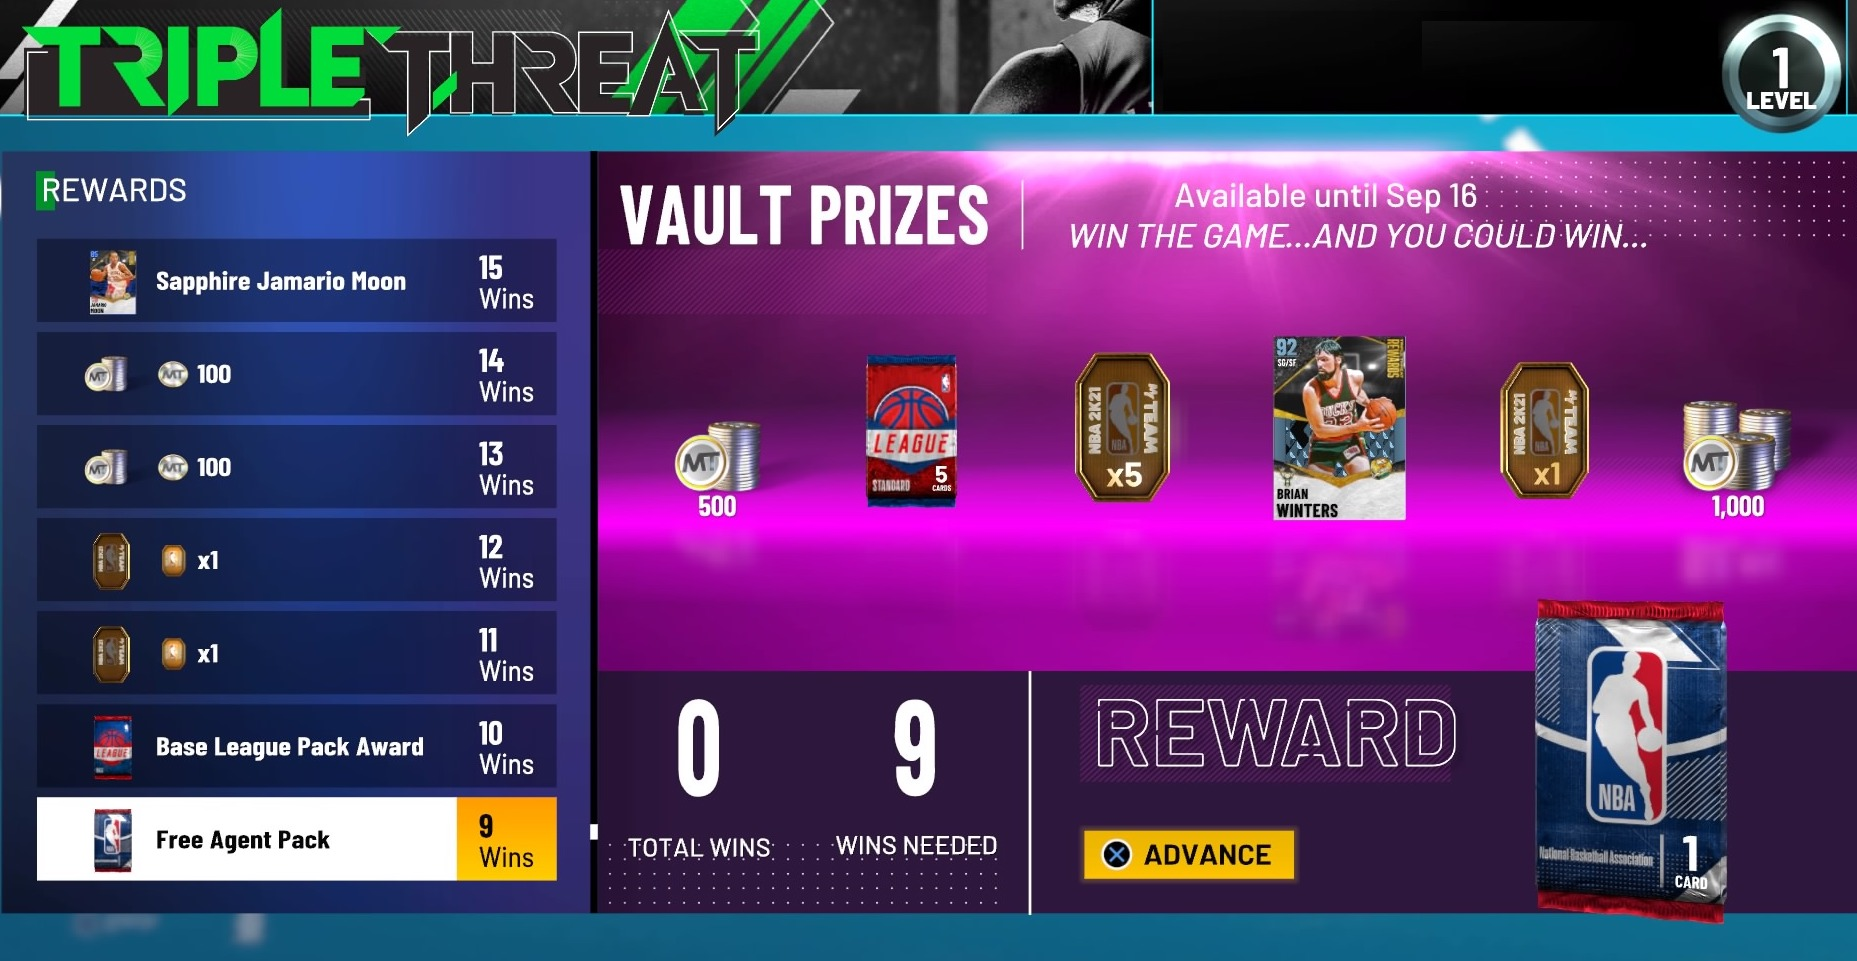 nba 2k21 myteam triple threat rewards